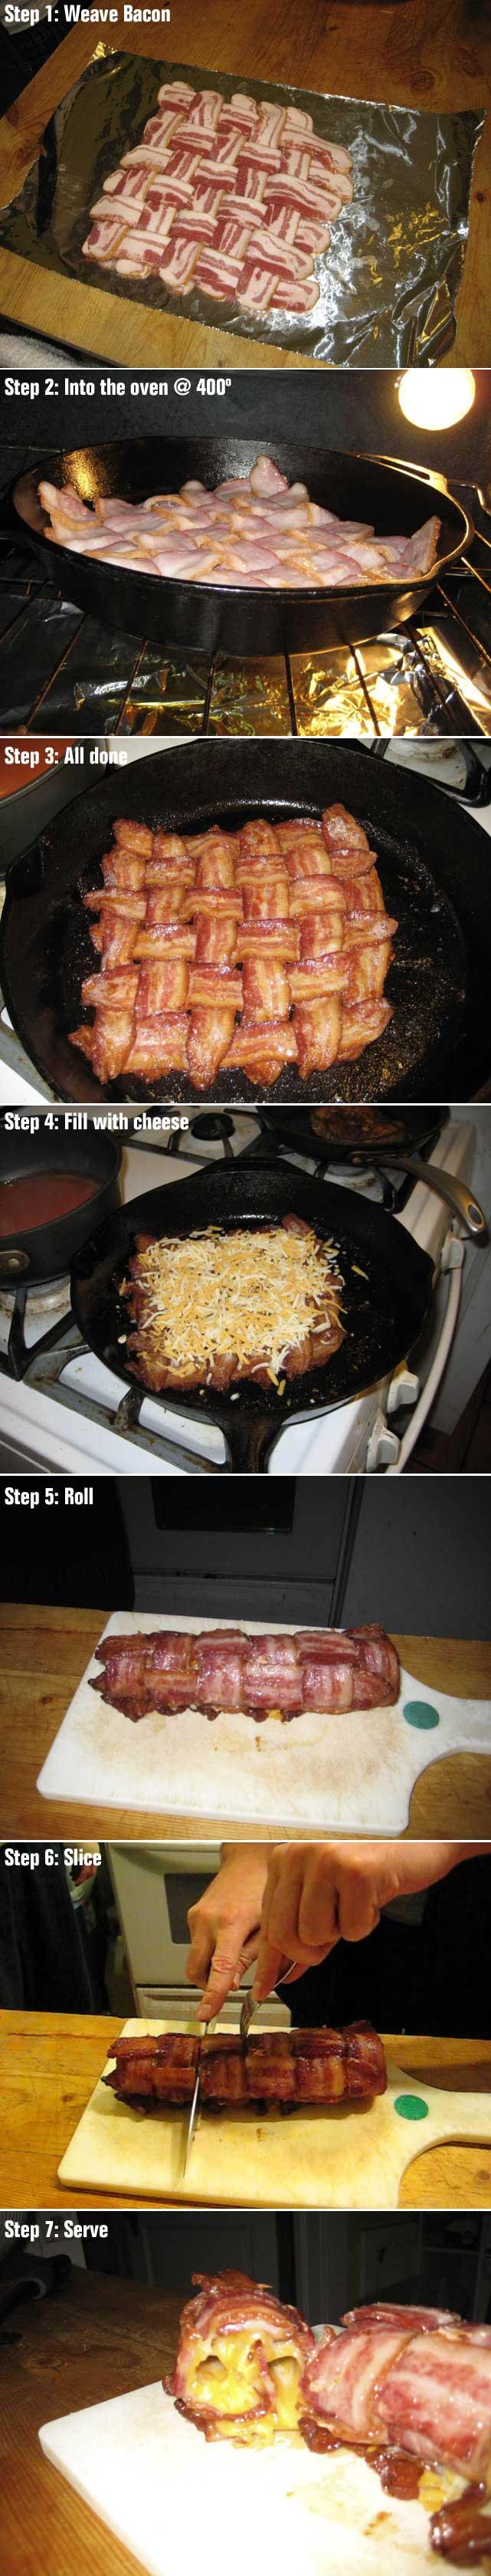 gourmetbacon. oh my :)